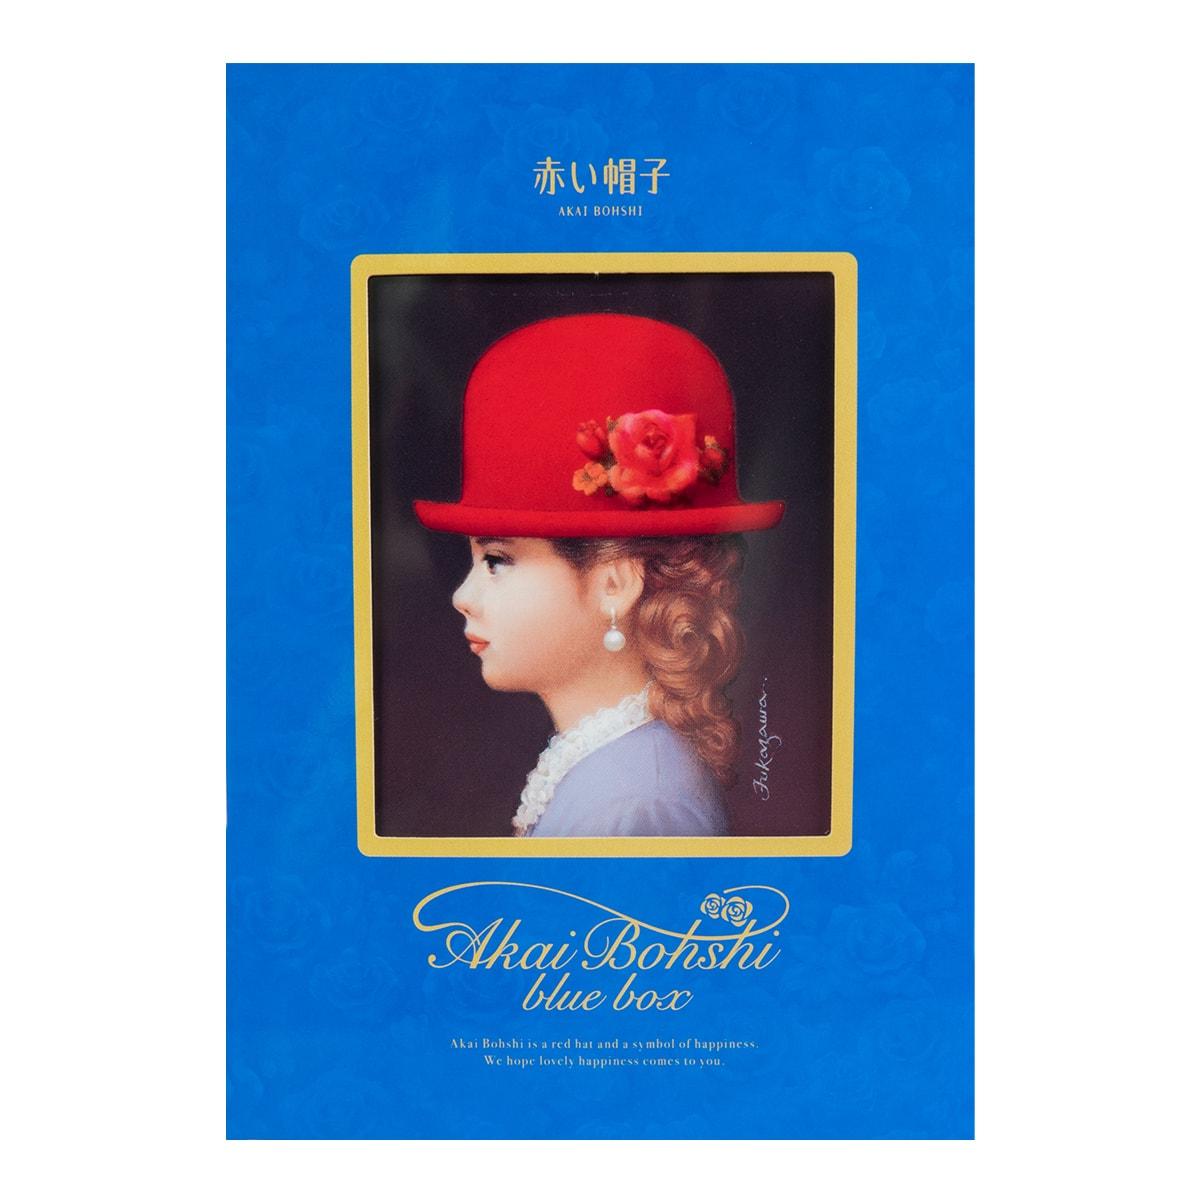 TIVOLINA Akai Bohshi Mixed Cookie Gift Box Bule Box 10pc